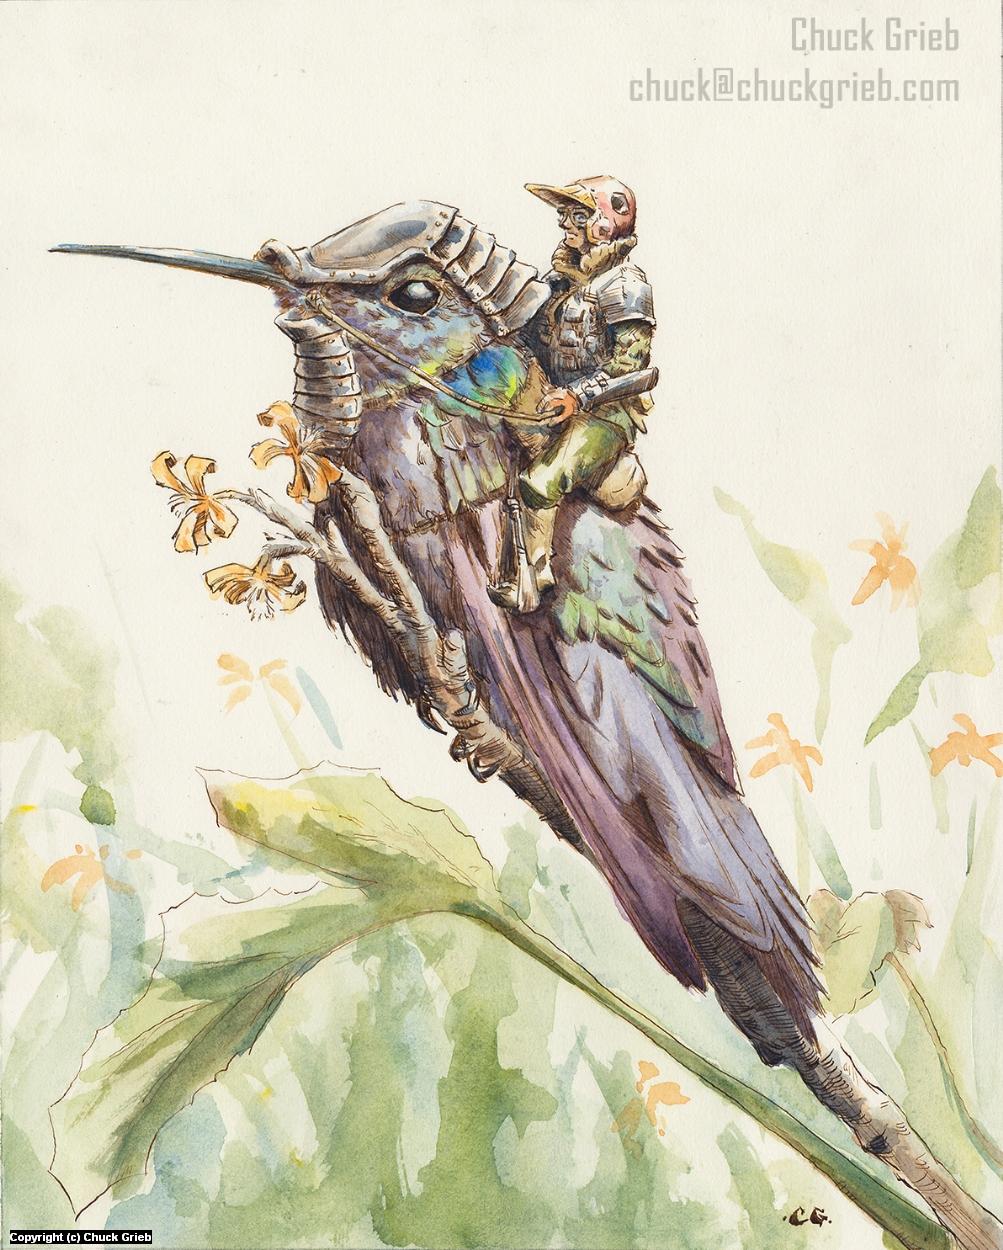 Hummingbird Warrior Artwork by Chuck Grieb